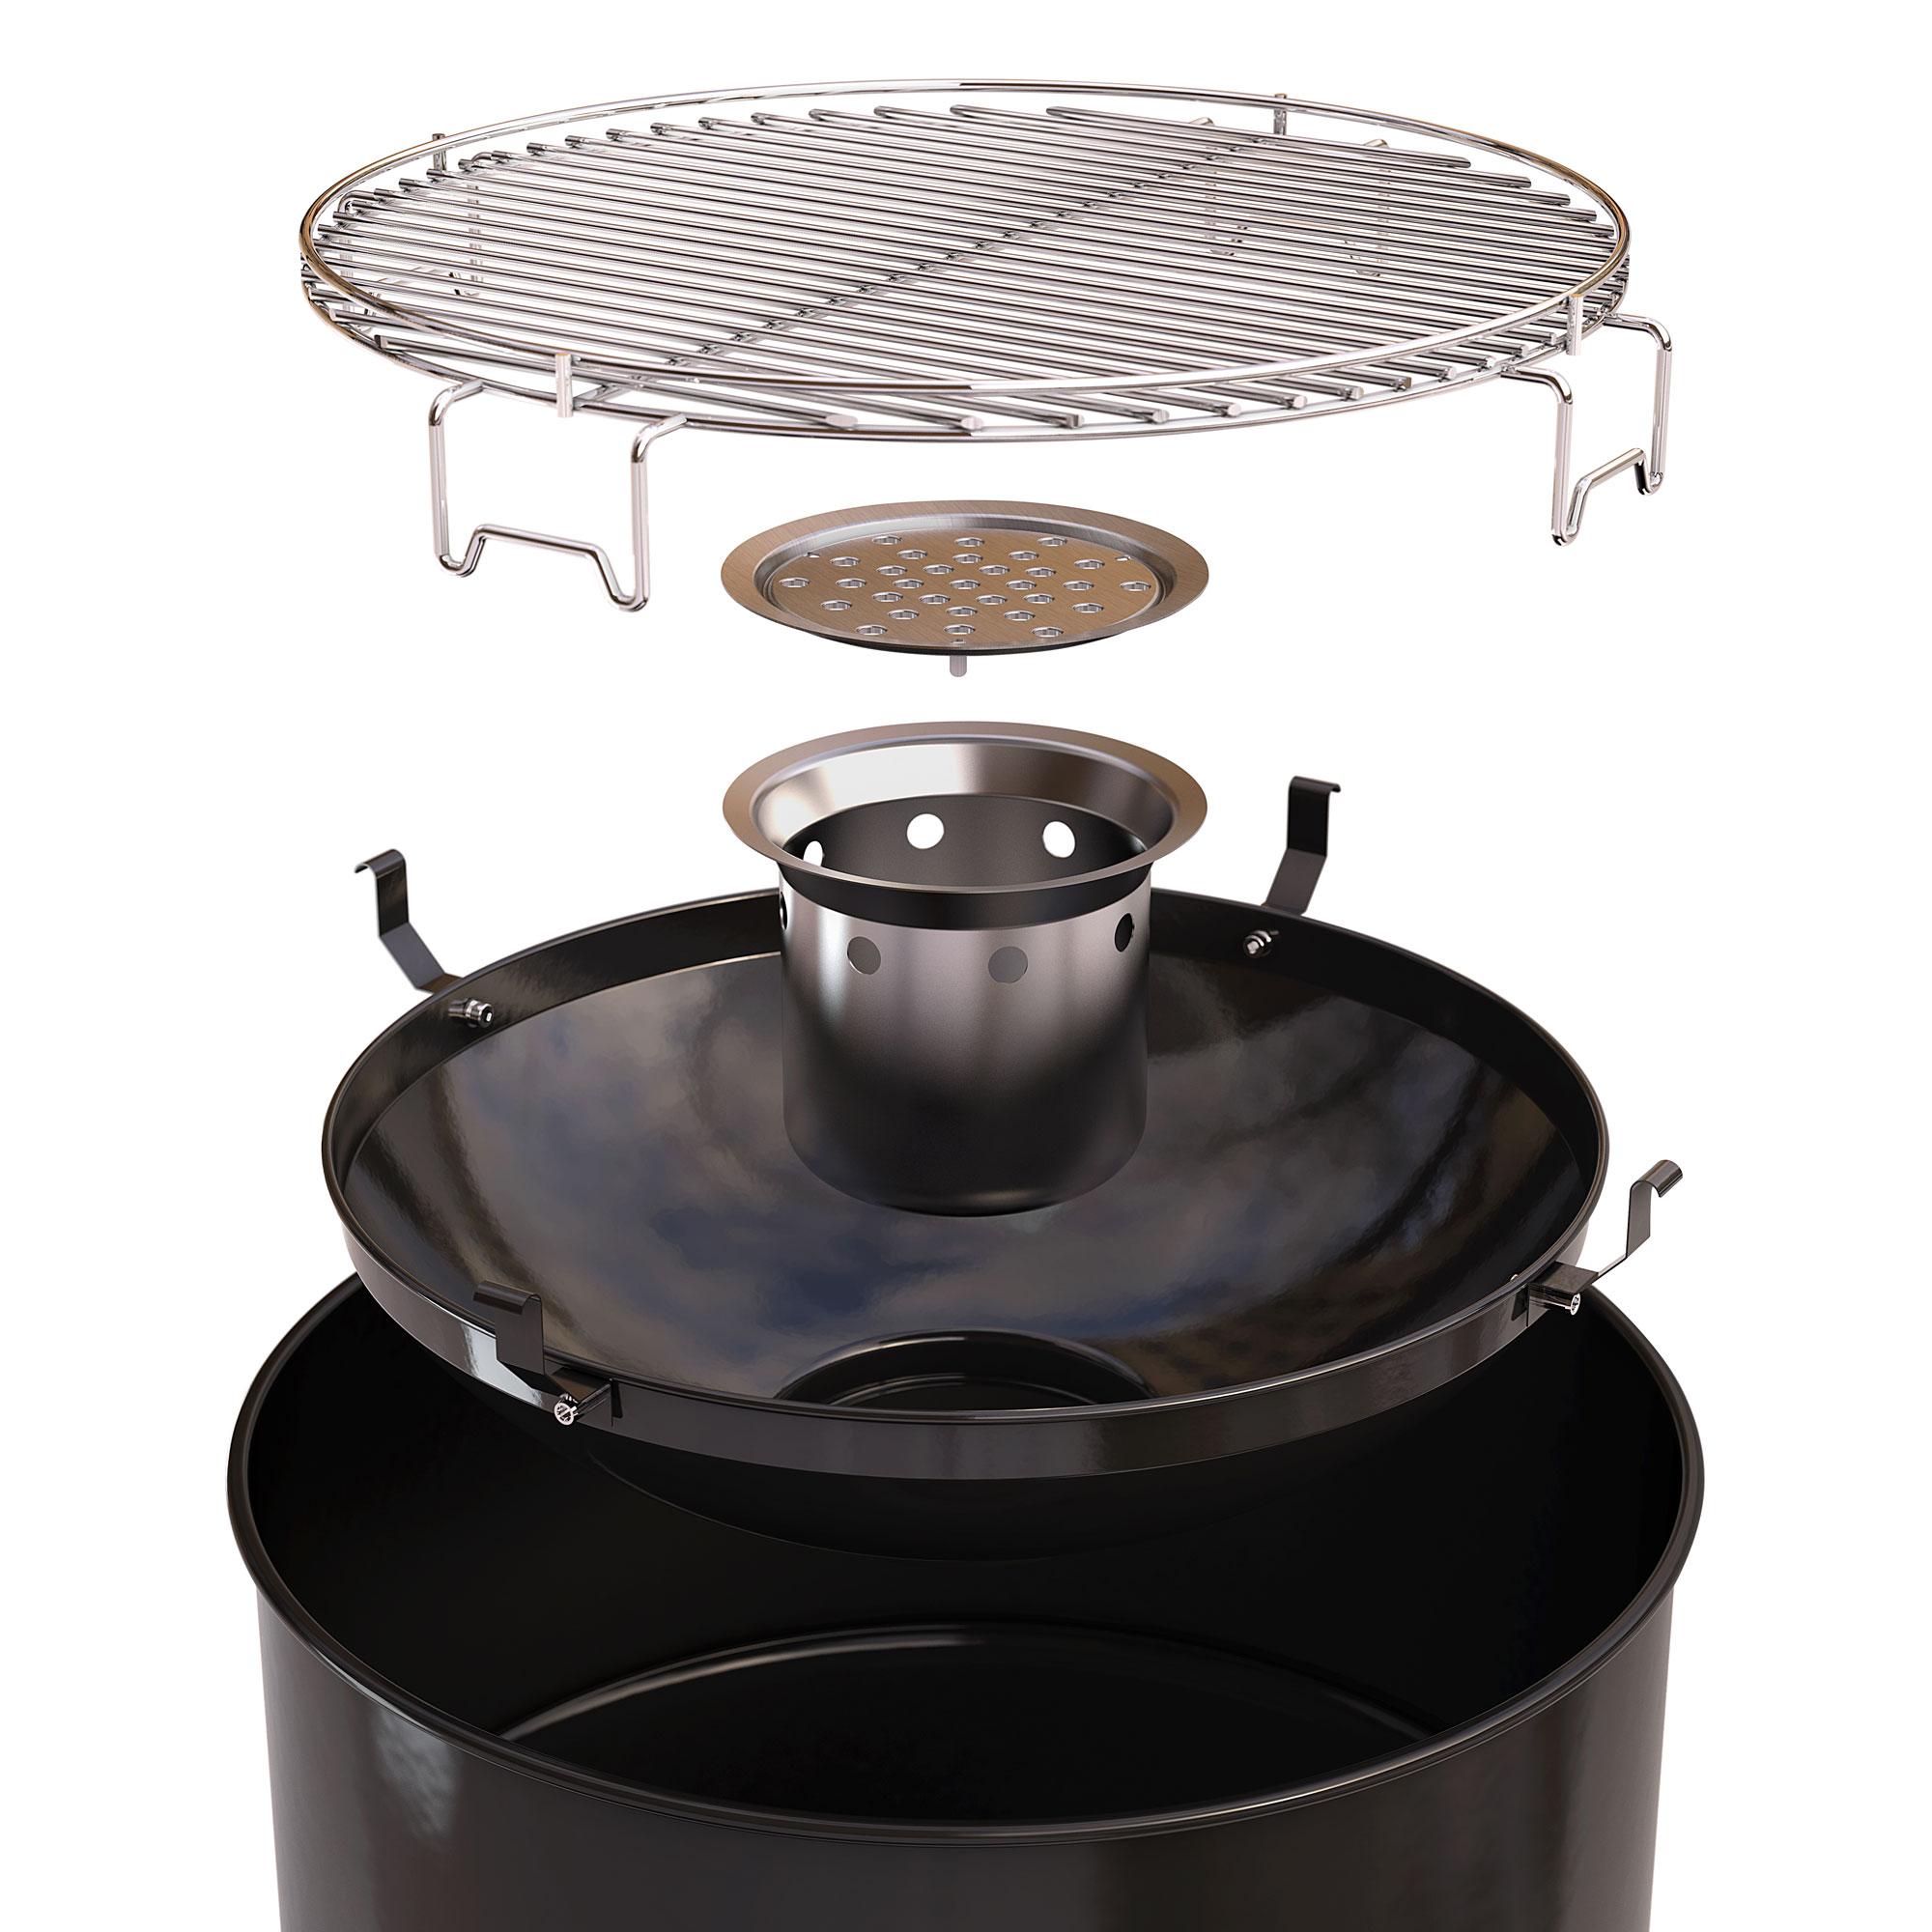 Grilltonne / Feuertonne barbecook Edson Black Grillfläche Ø47,5cm Bild 2